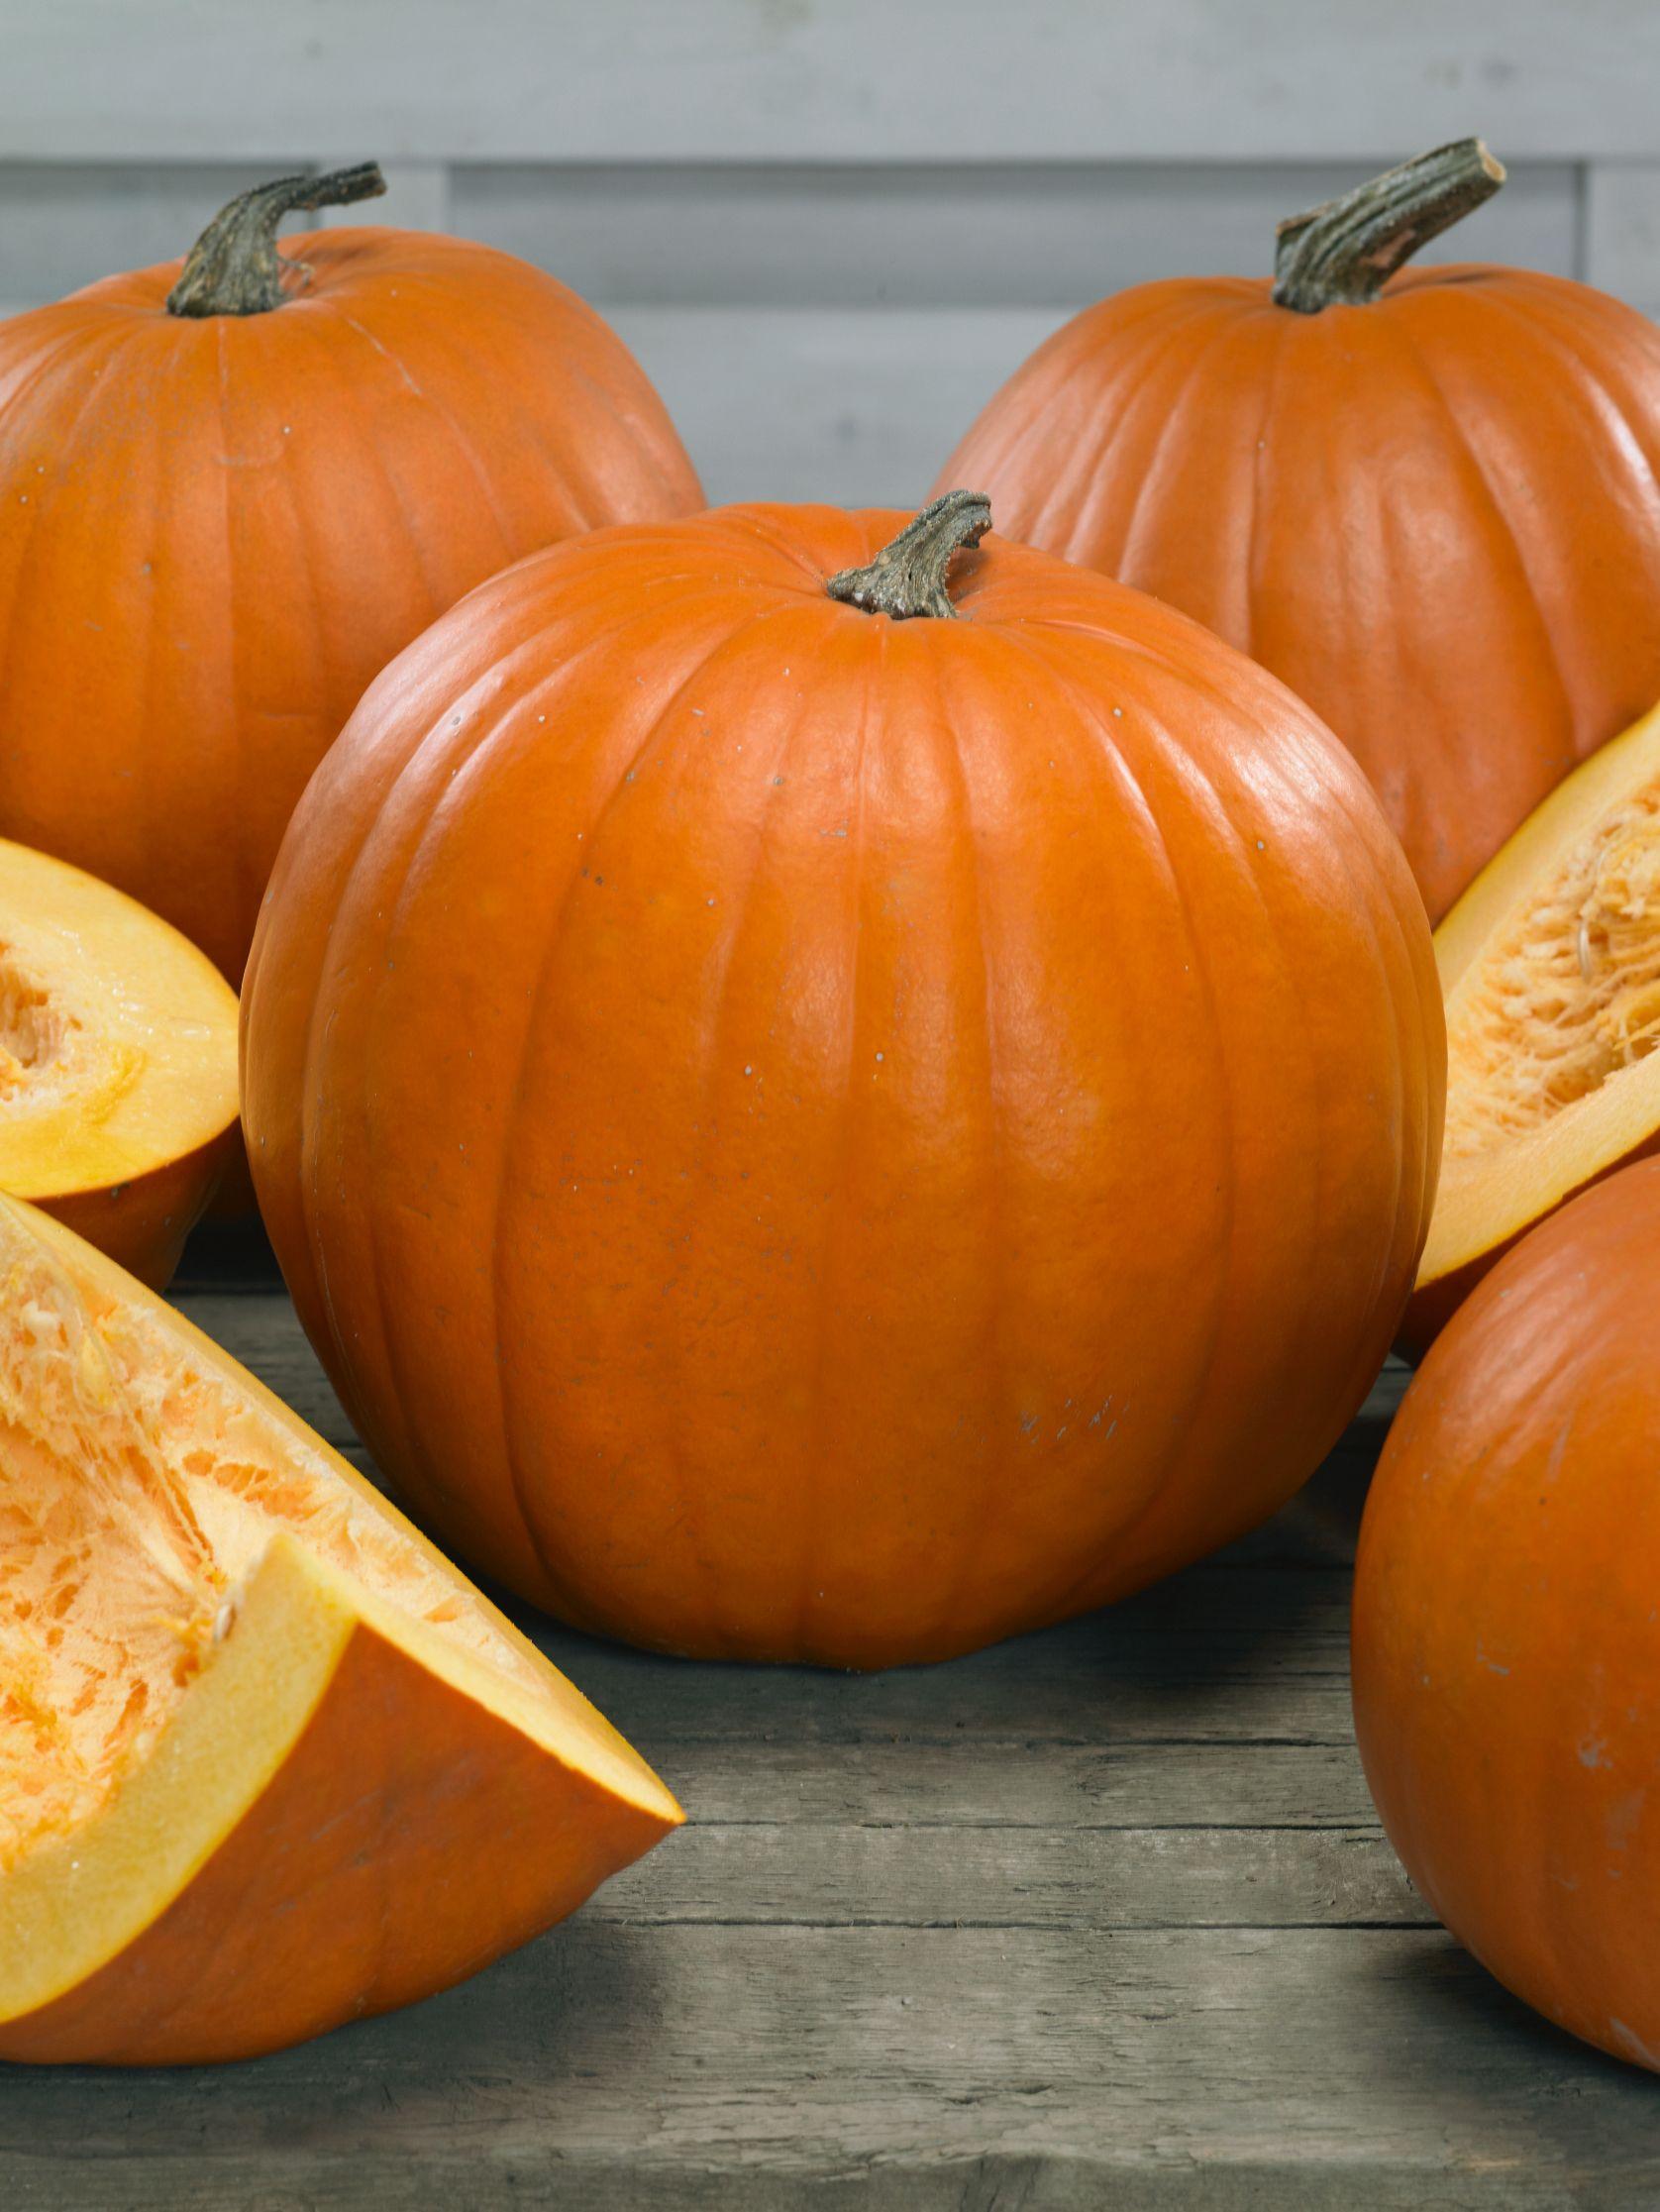 Pumpkin Pictures Pumpkin, Pumpkin pictures, Grow your